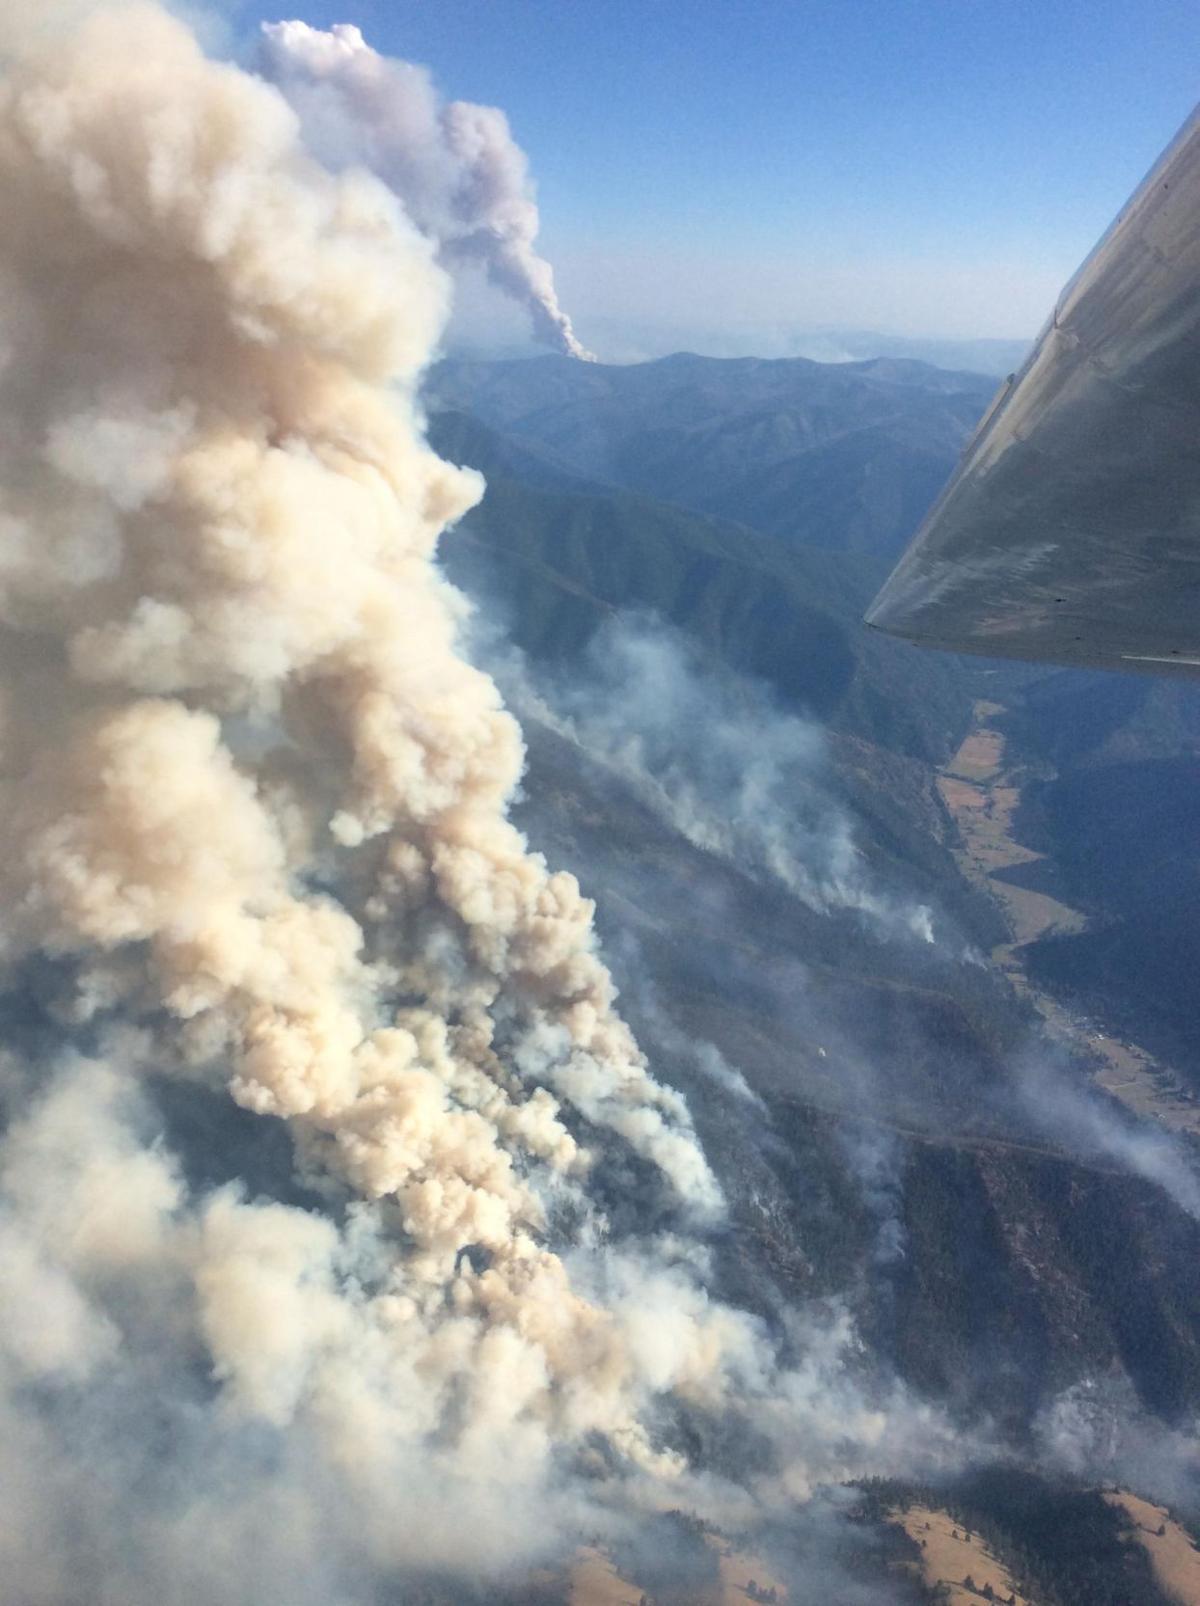 $400 million spent on Montana wildfires this year | Montana ...